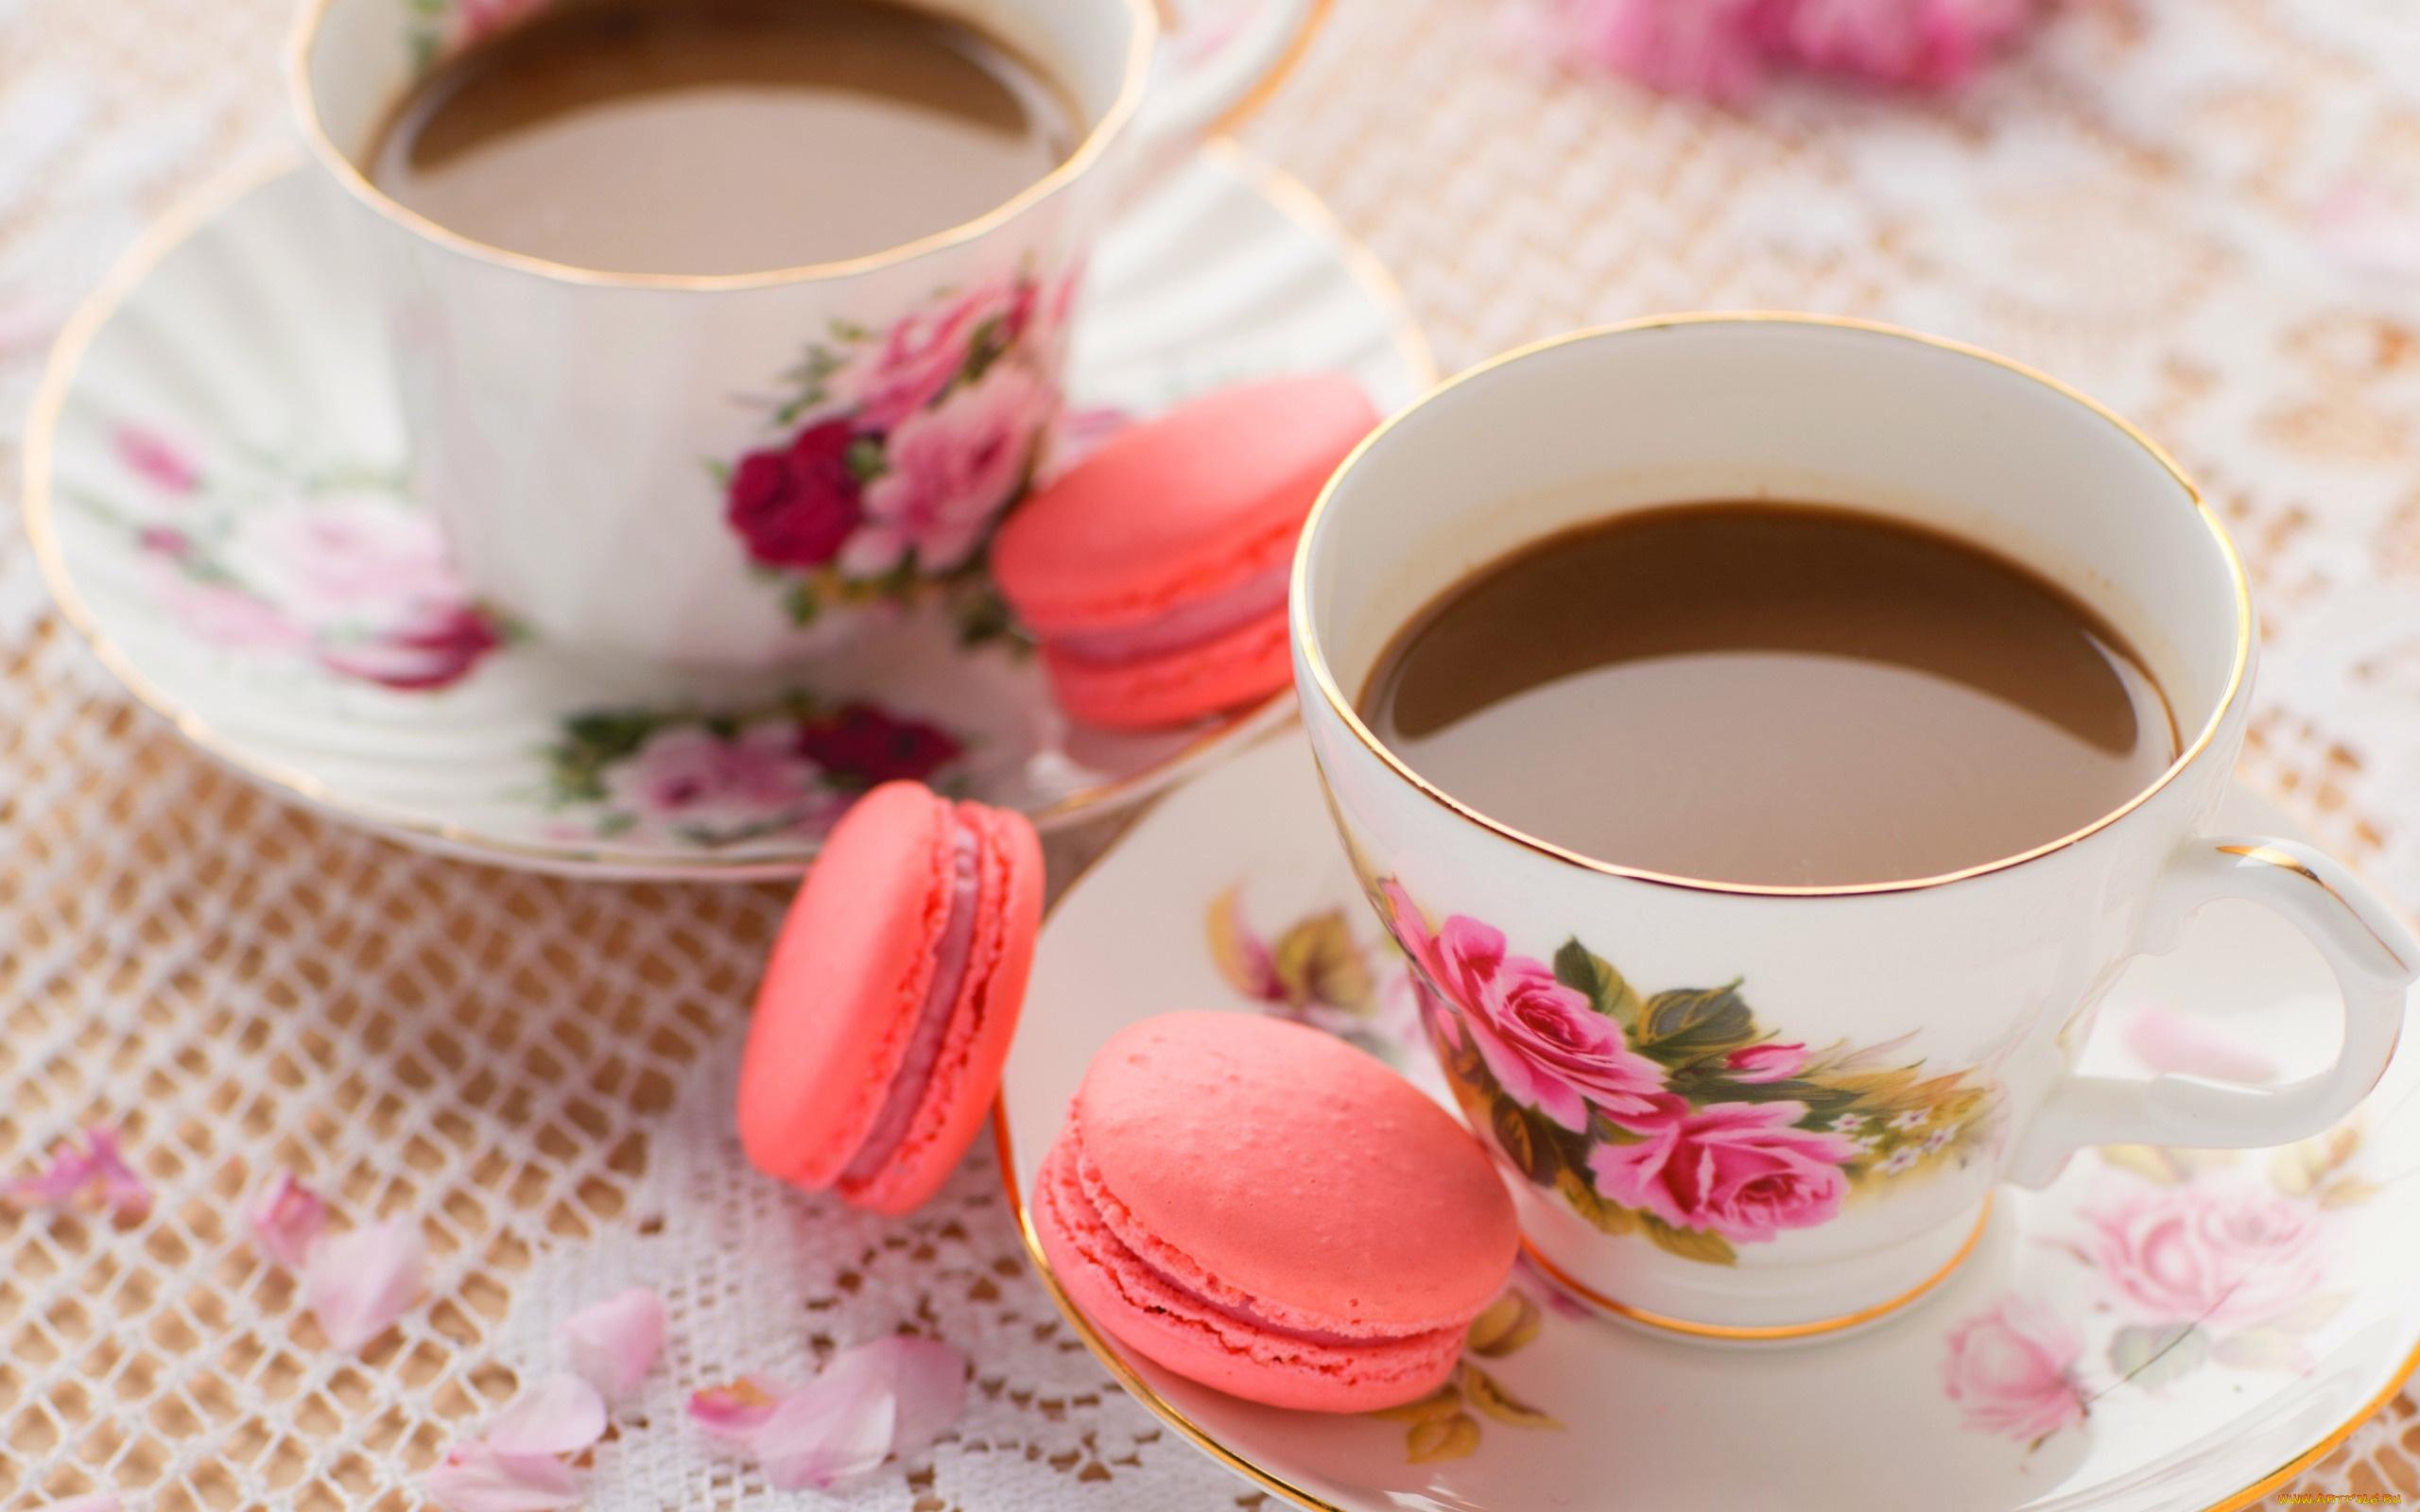 Таможенника картинки, кофе со сладостями картинки